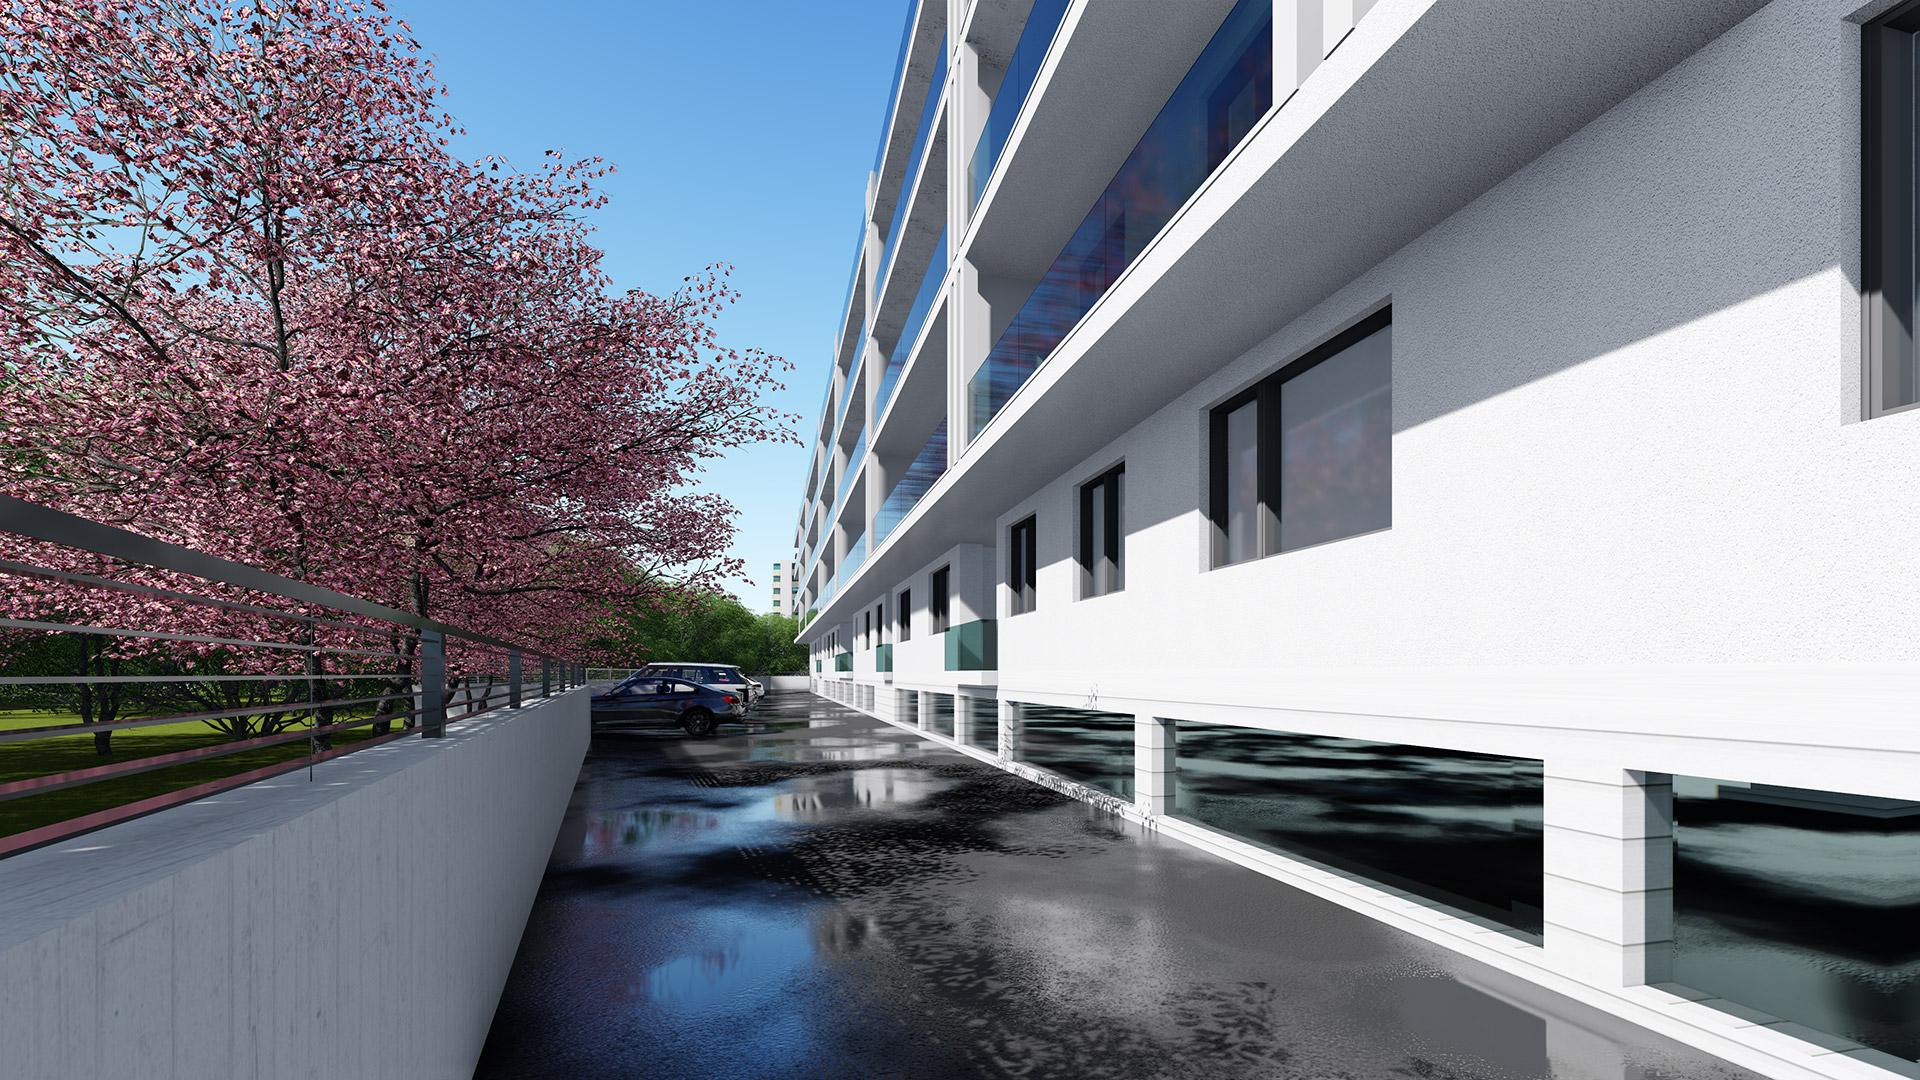 Catedral Residence - Apartamente si garsoniere de vanzare Bucuresti, Gheorghieni, Marriott, Piata Unirii, 13 Septembrie, Izvor - 7